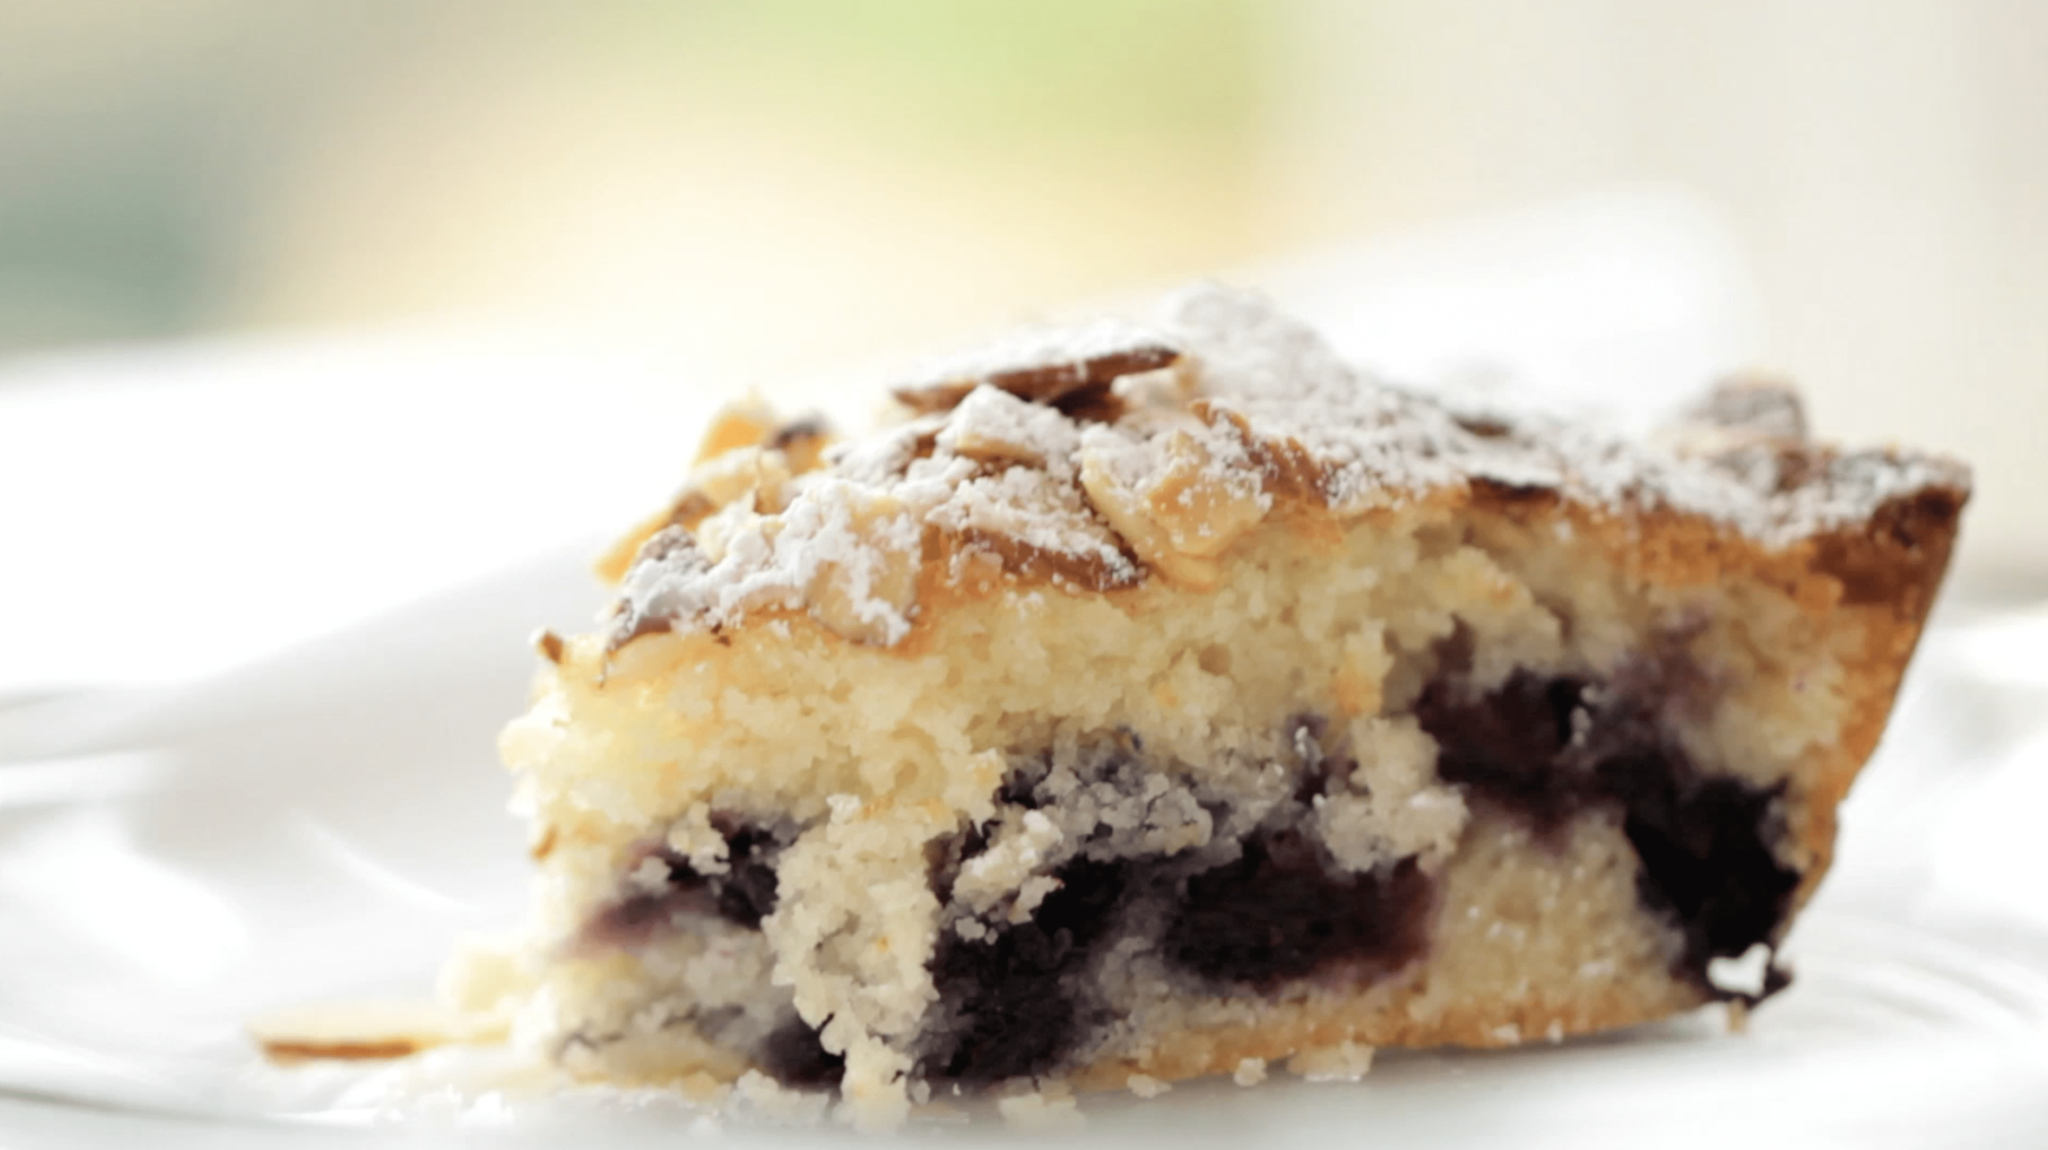 Blueberry Almond Team Cake